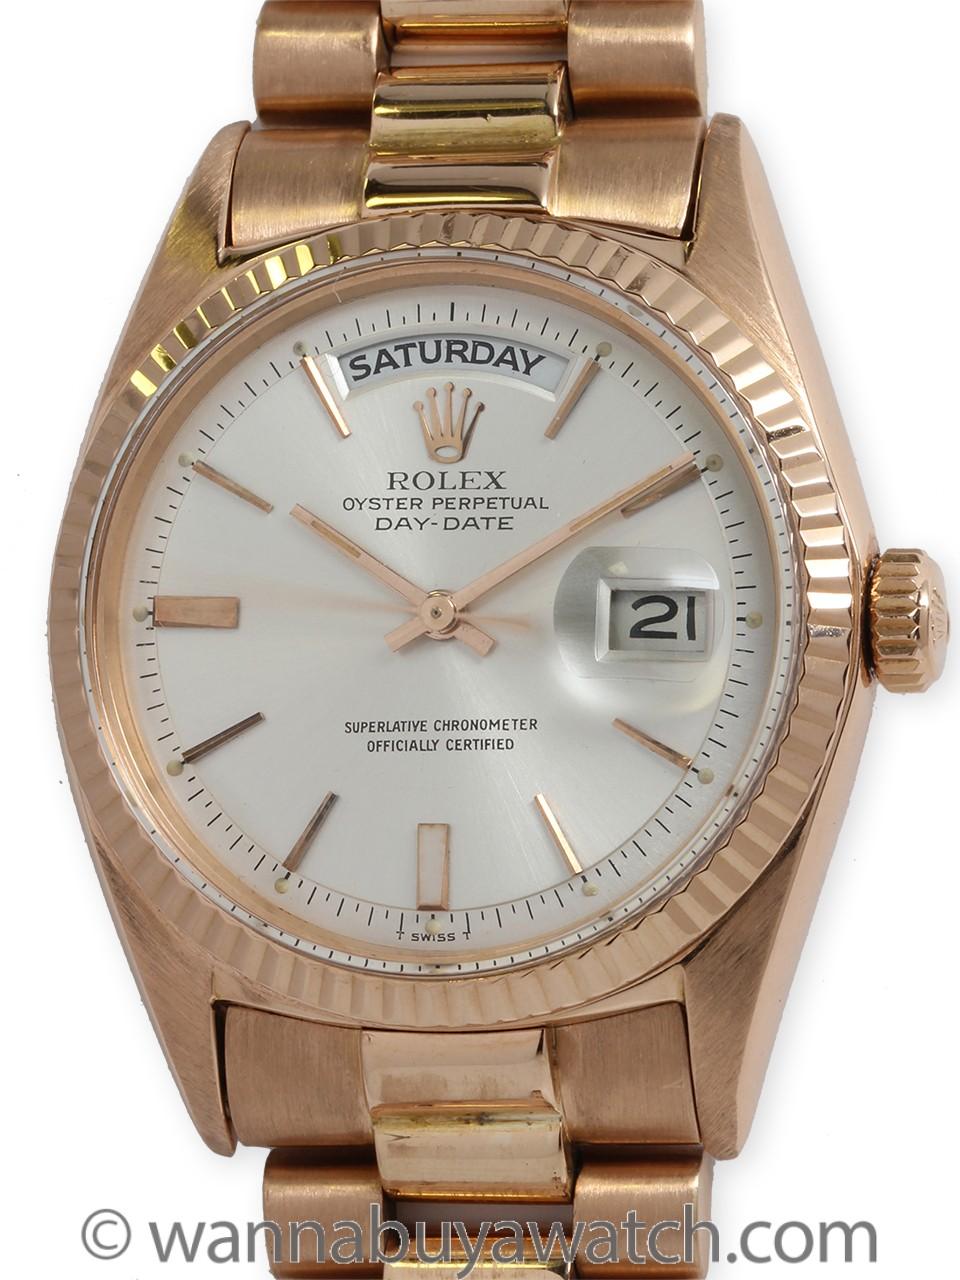 Rolex 18K PG Day Date President ref 1803 circa 1965